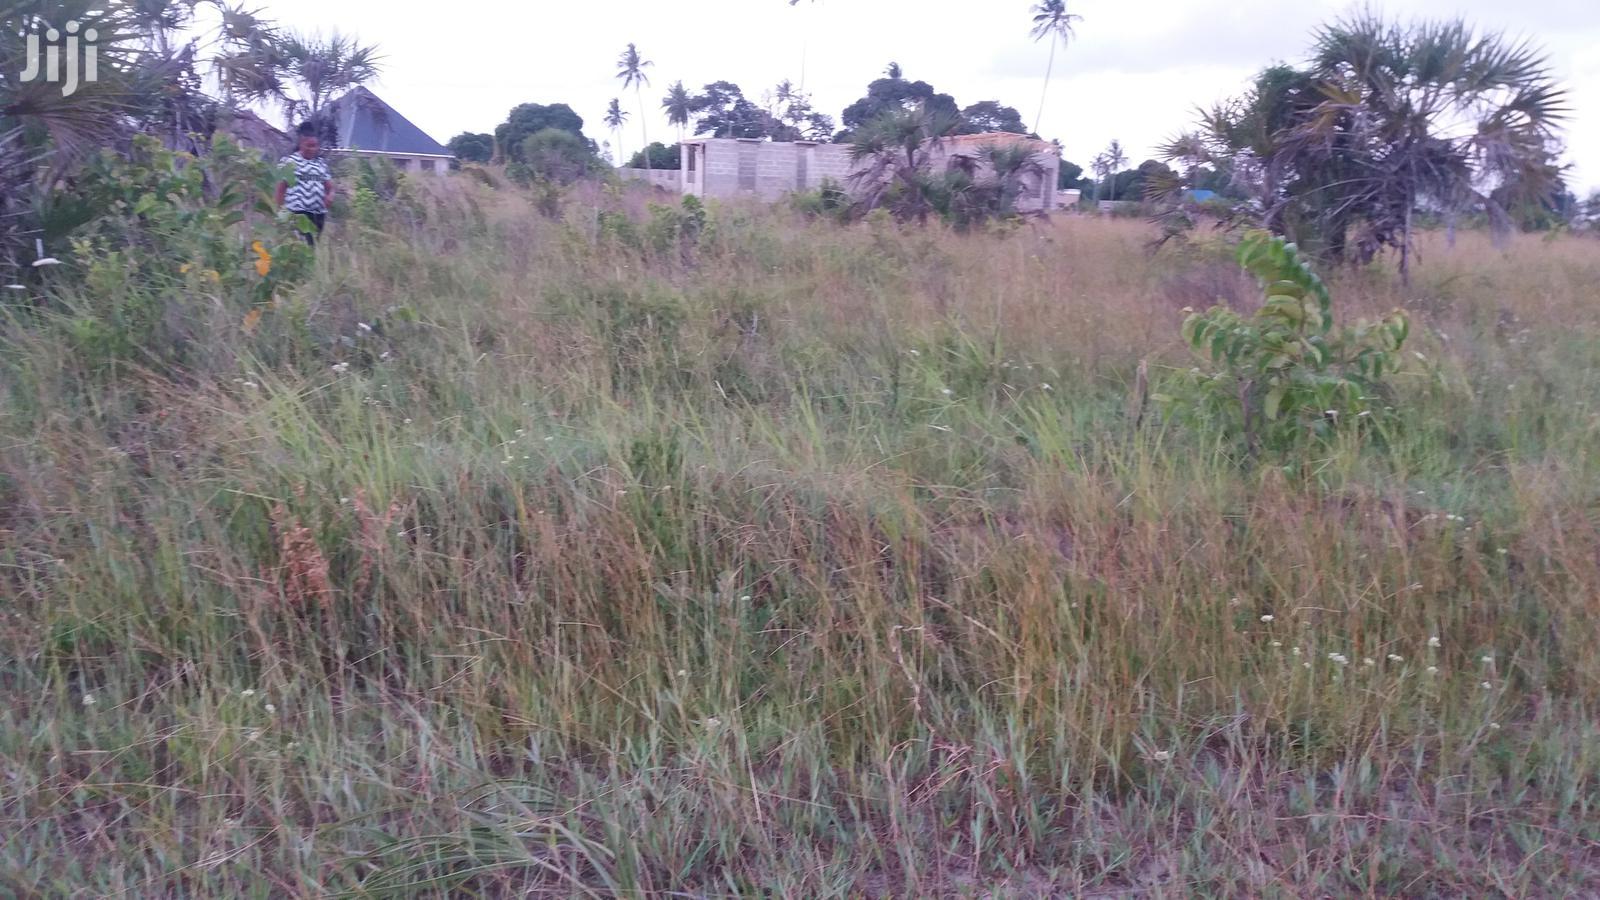 Land for Sale Kigamboni | Land & Plots For Sale for sale in Kigamboni, Temeke, Tanzania